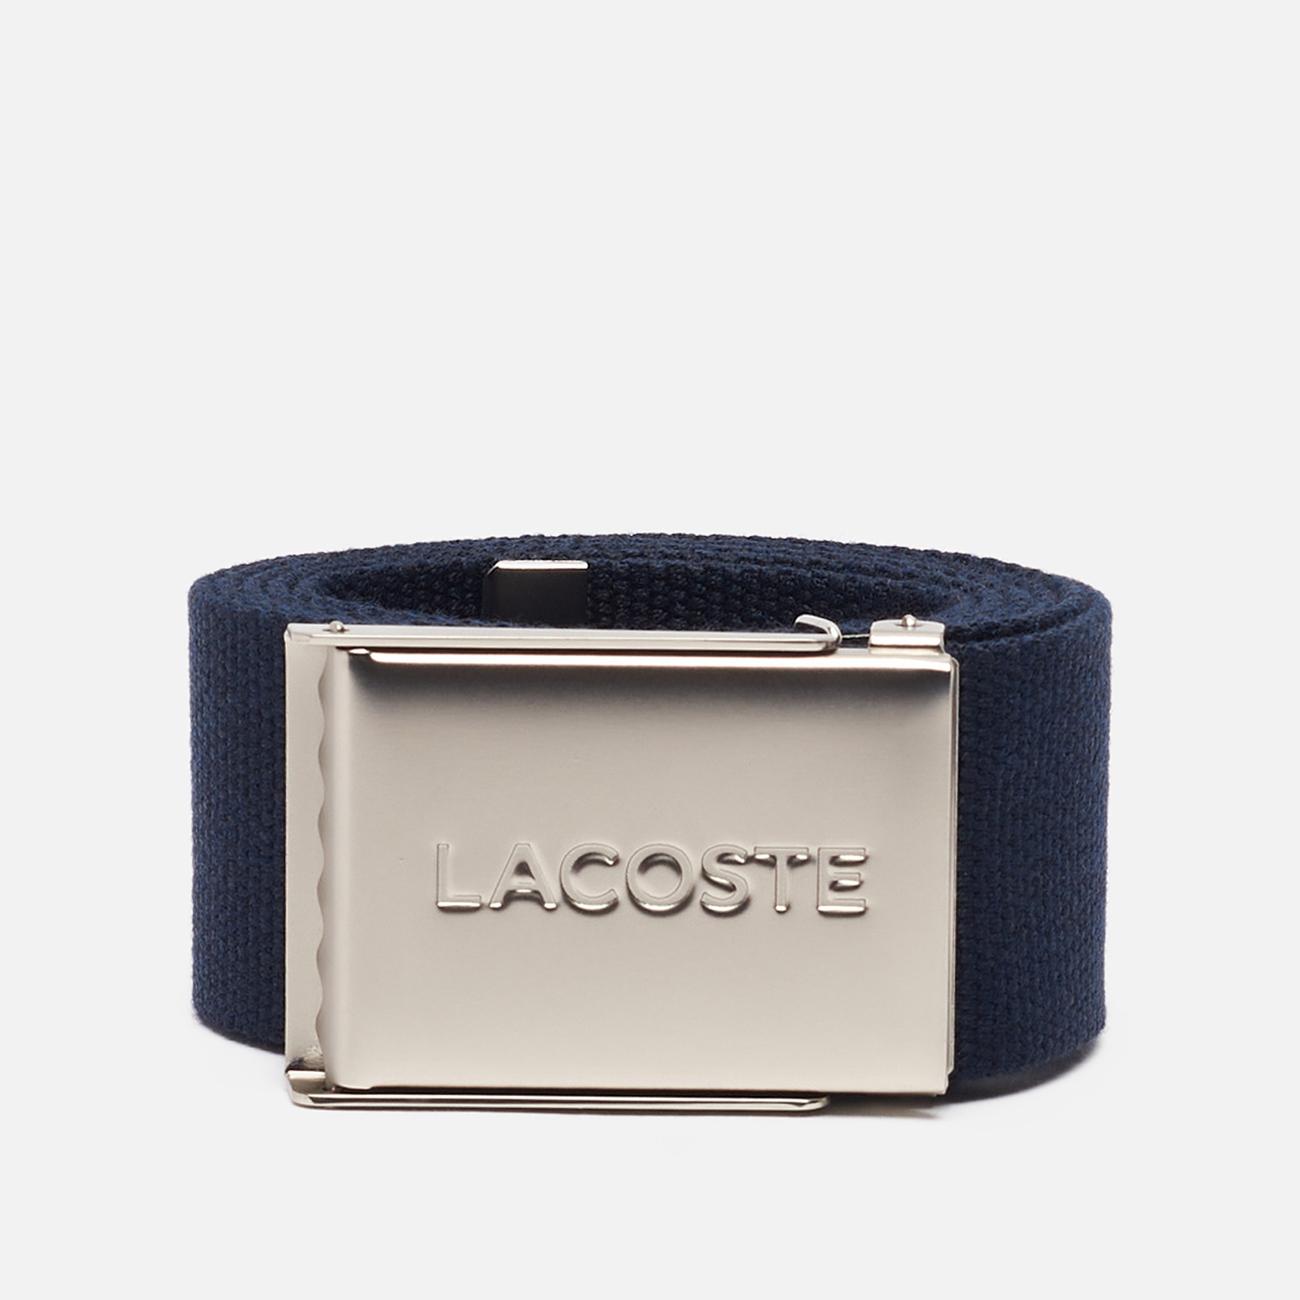 Ремень Lacoste Engraved Buckle Woven Navy Blue